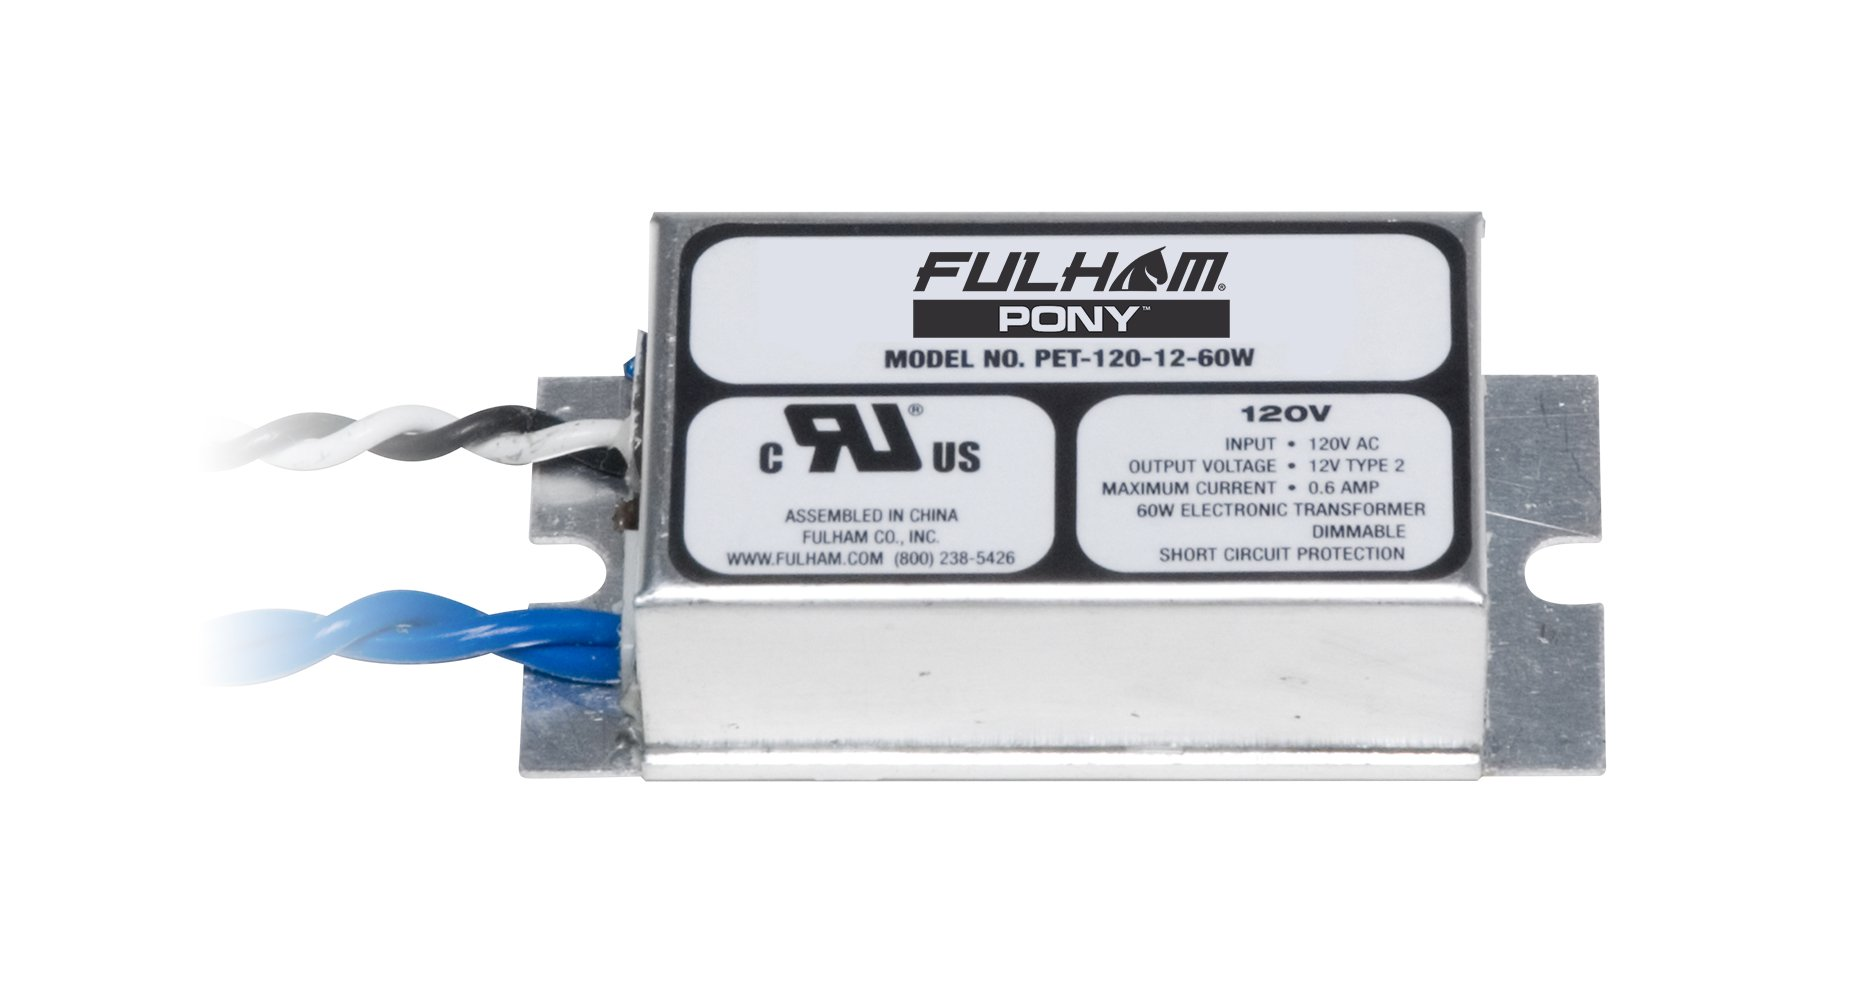 Fulham PET-120-12-60 Low Voltage Transformer